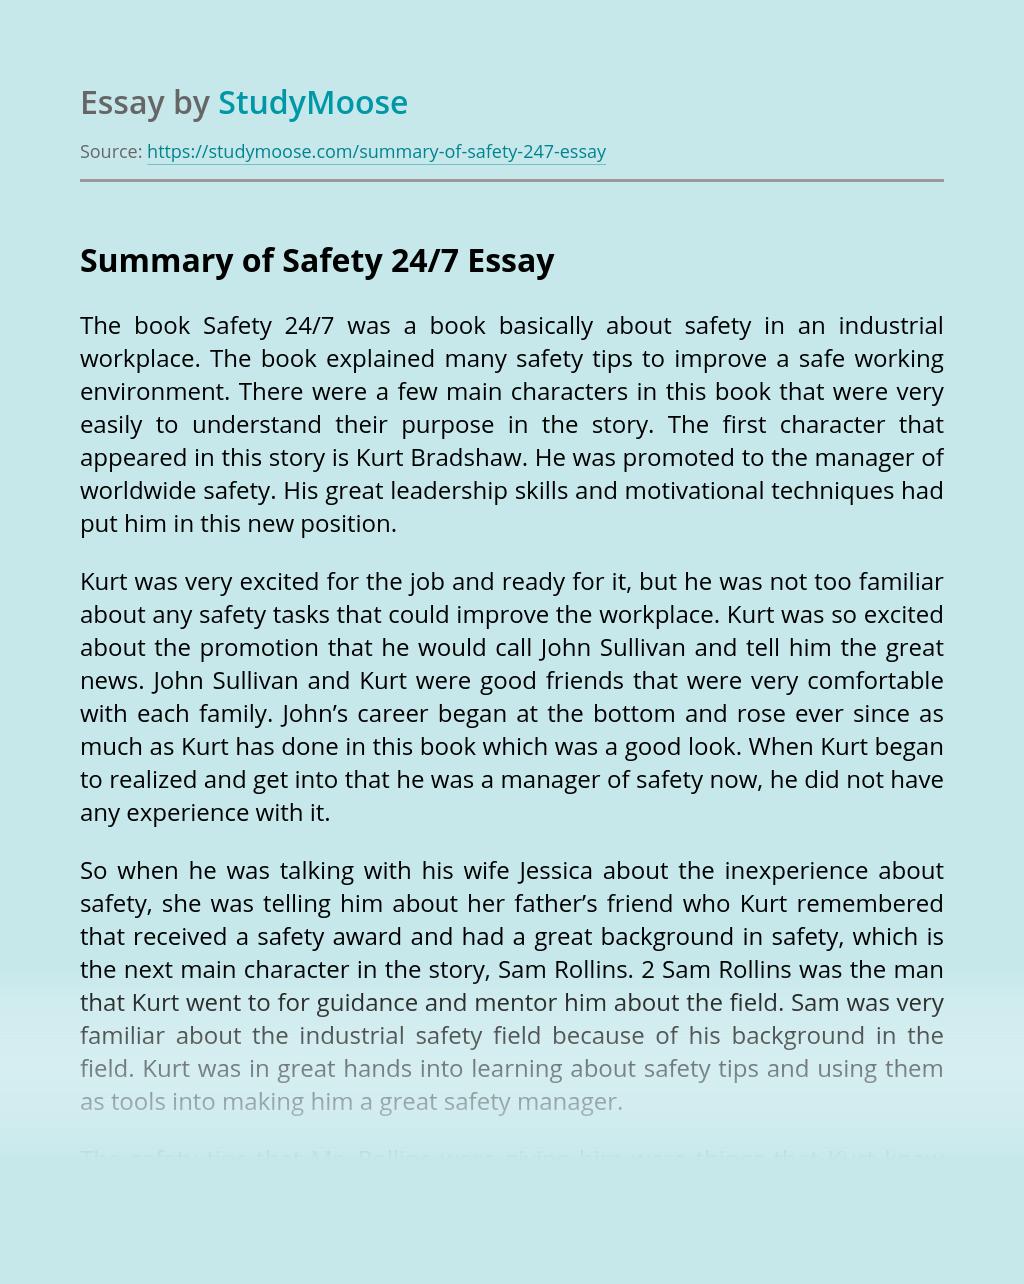 Summary of Safety 24/7